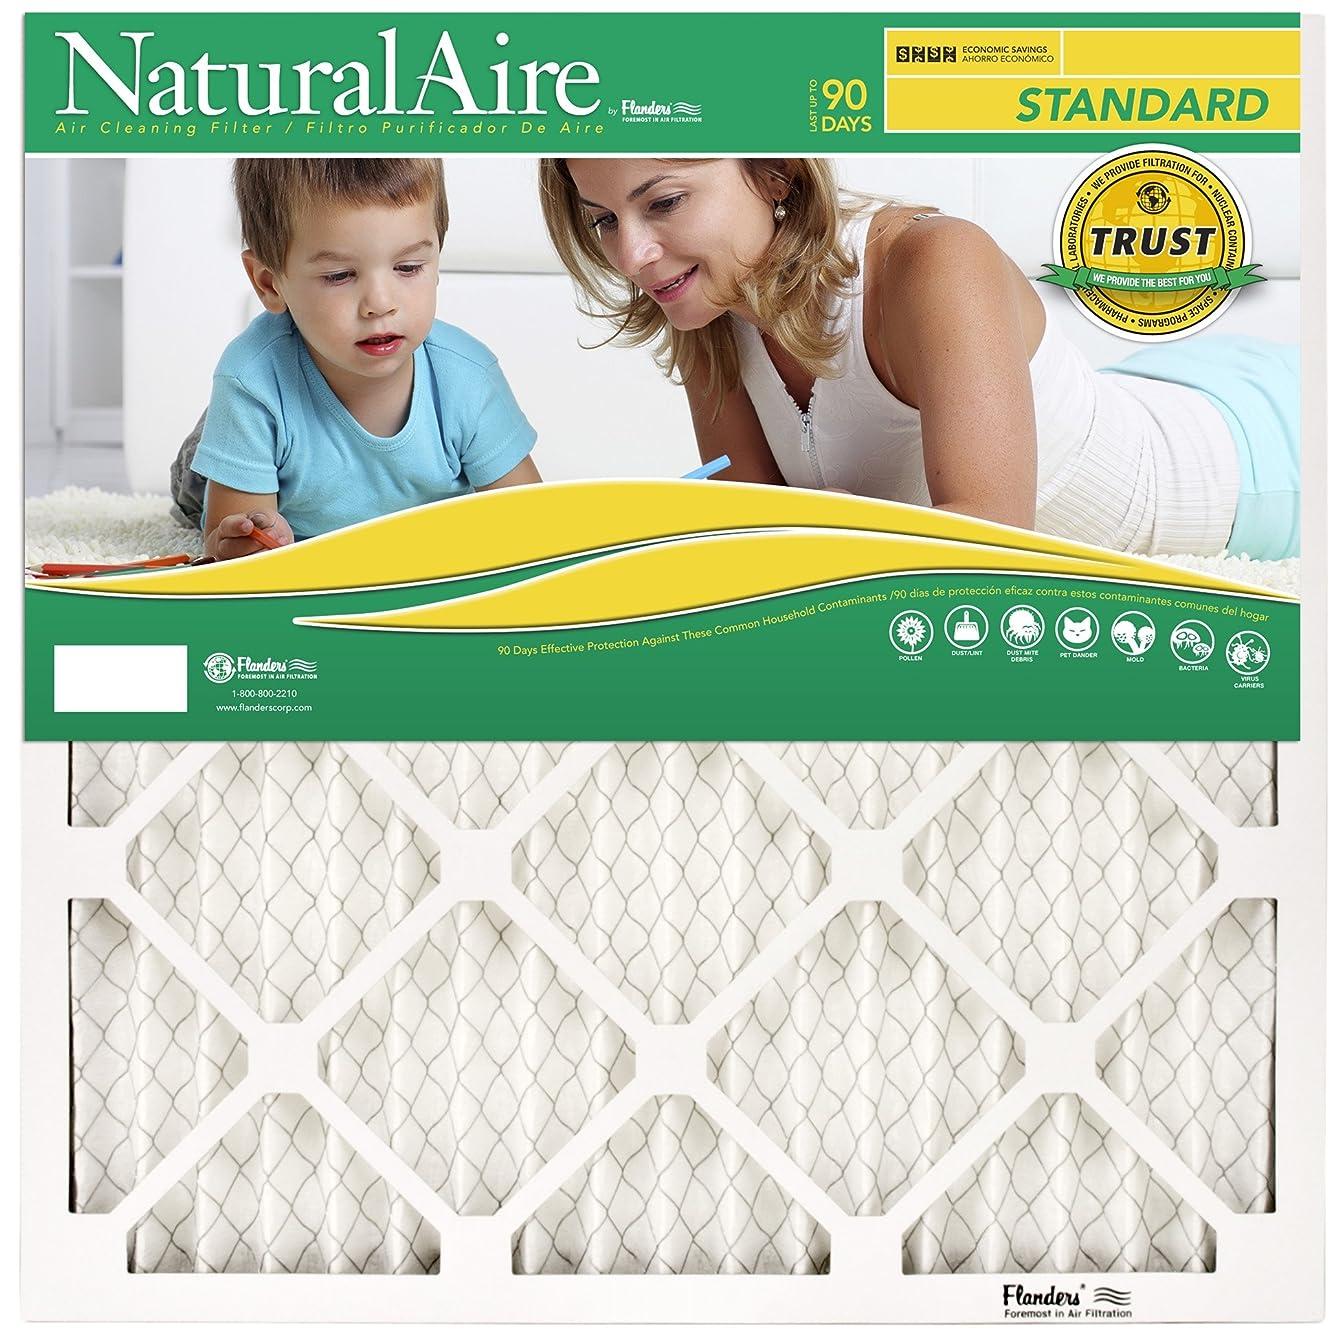 NaturalAire Standard Air Filter, MERV 8, 23.5 x 23.5, 1-inch, 12-Pack